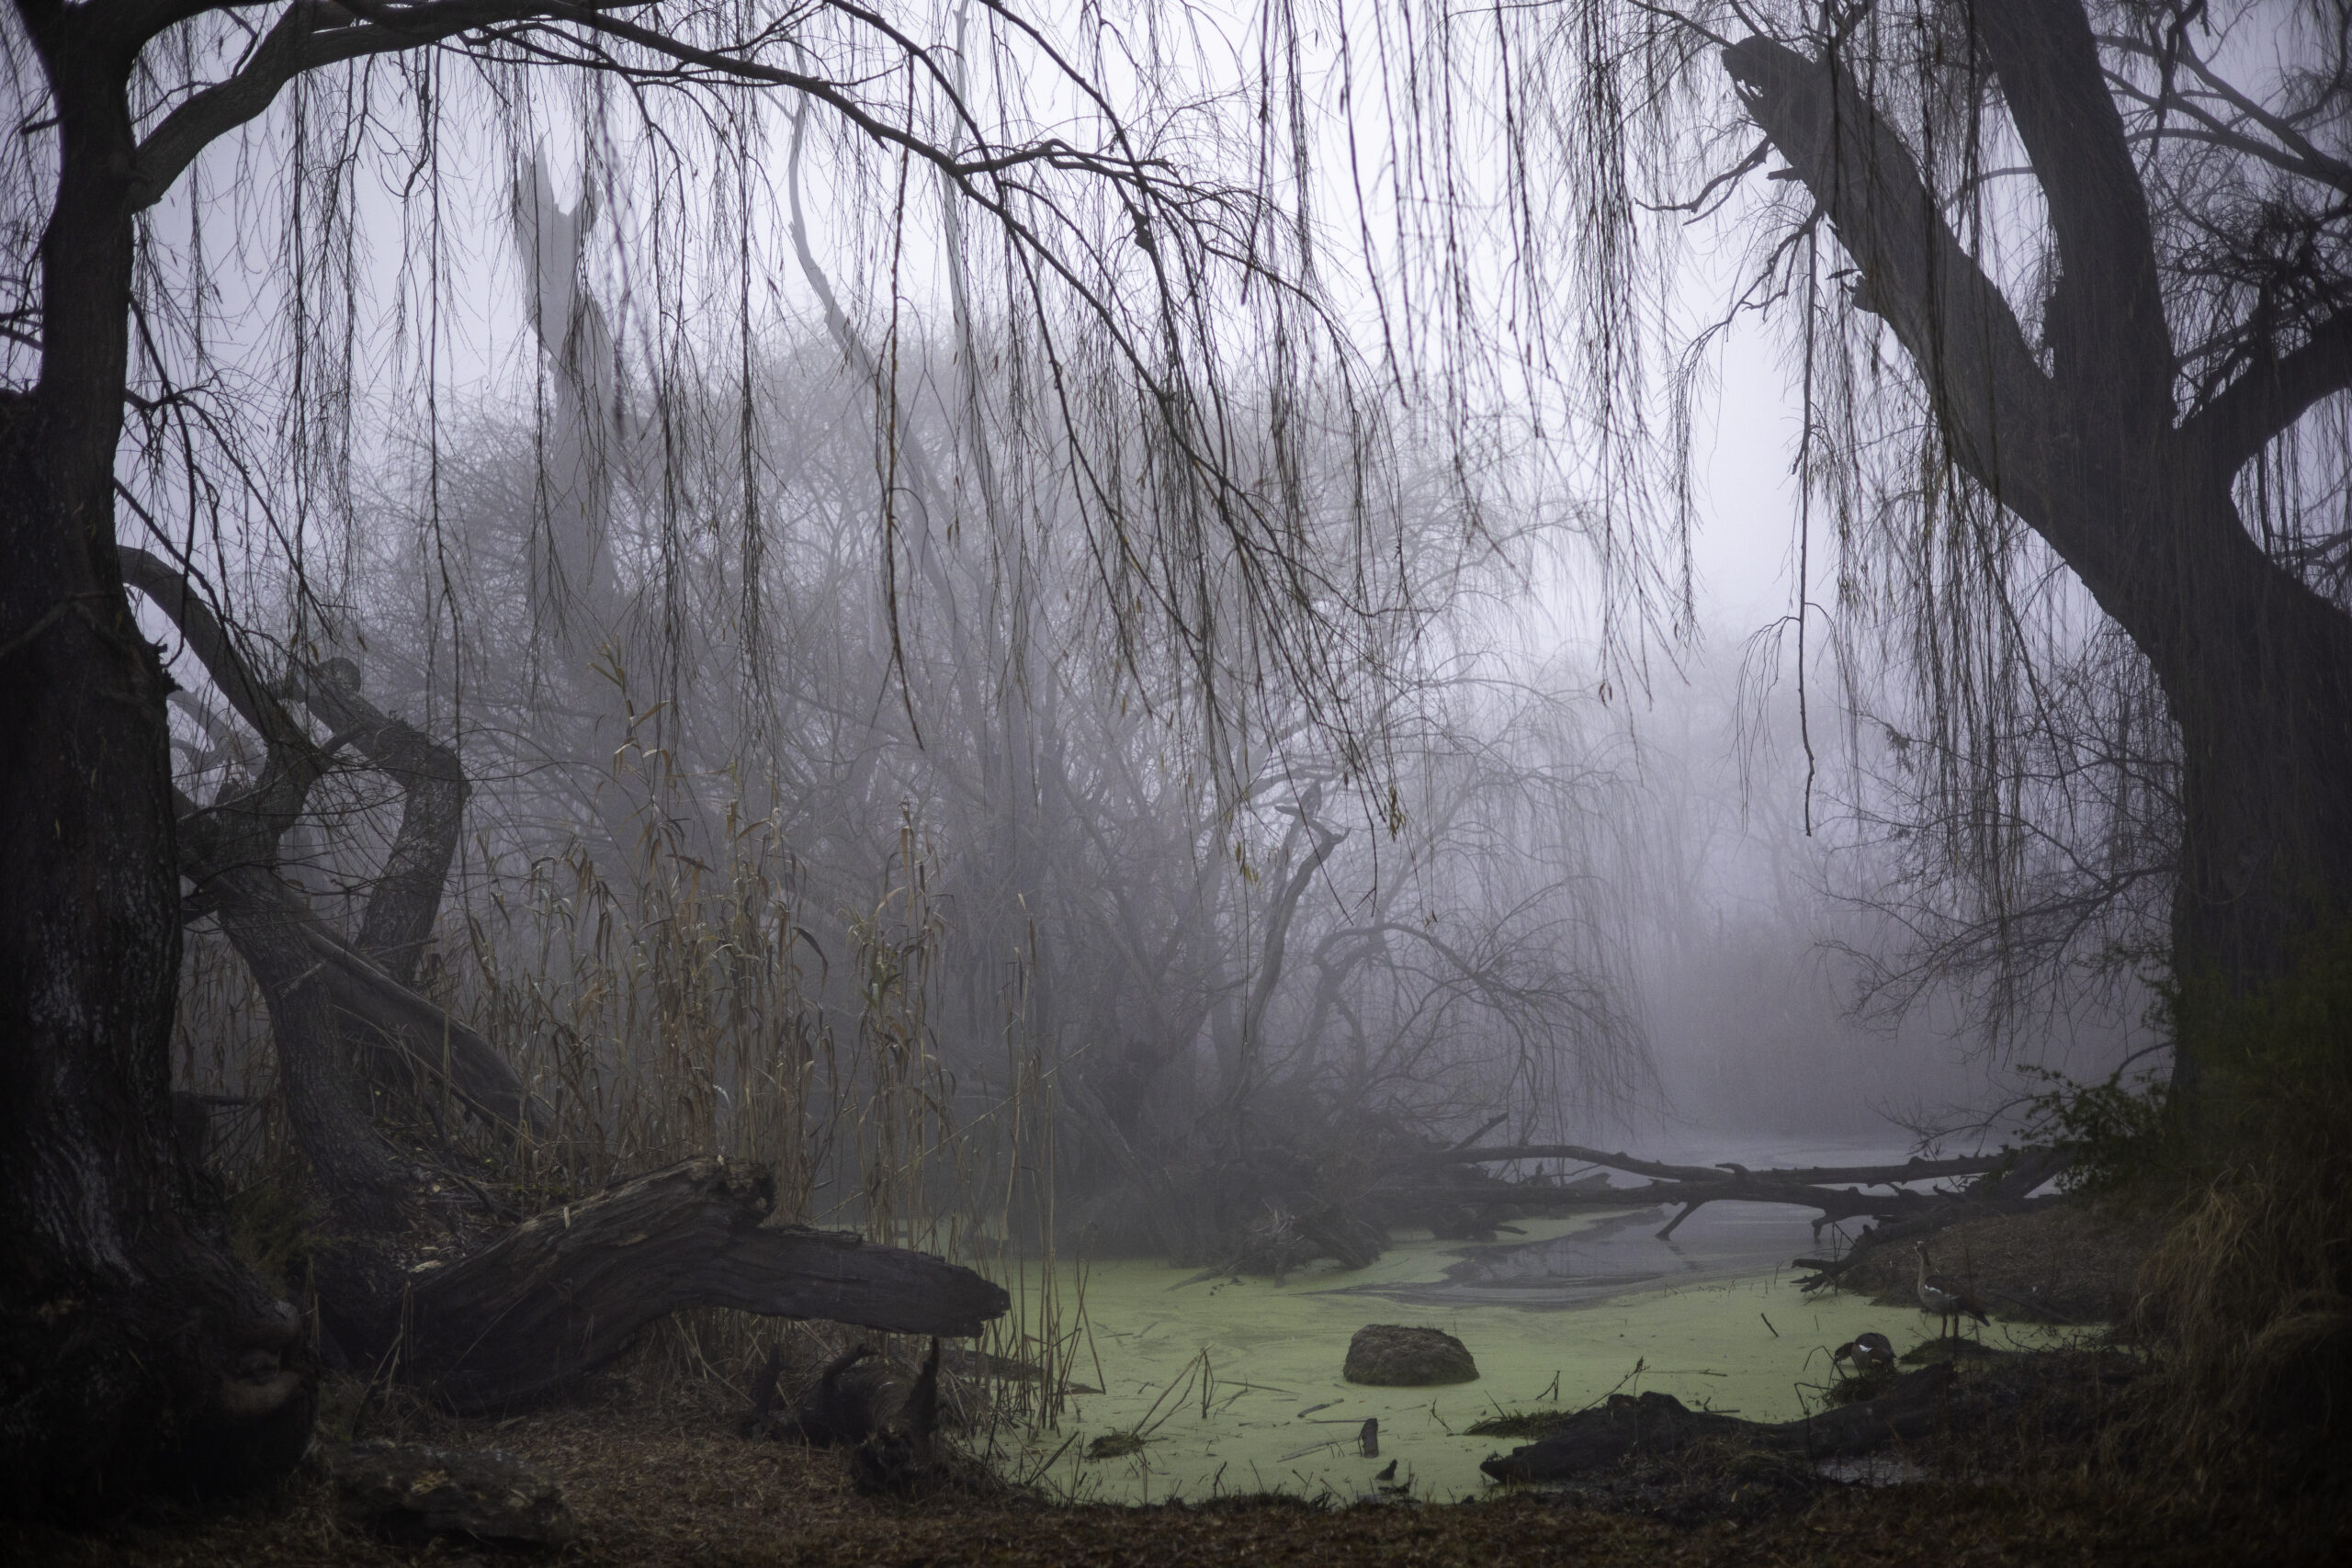 Misty morning at Rietvlei.